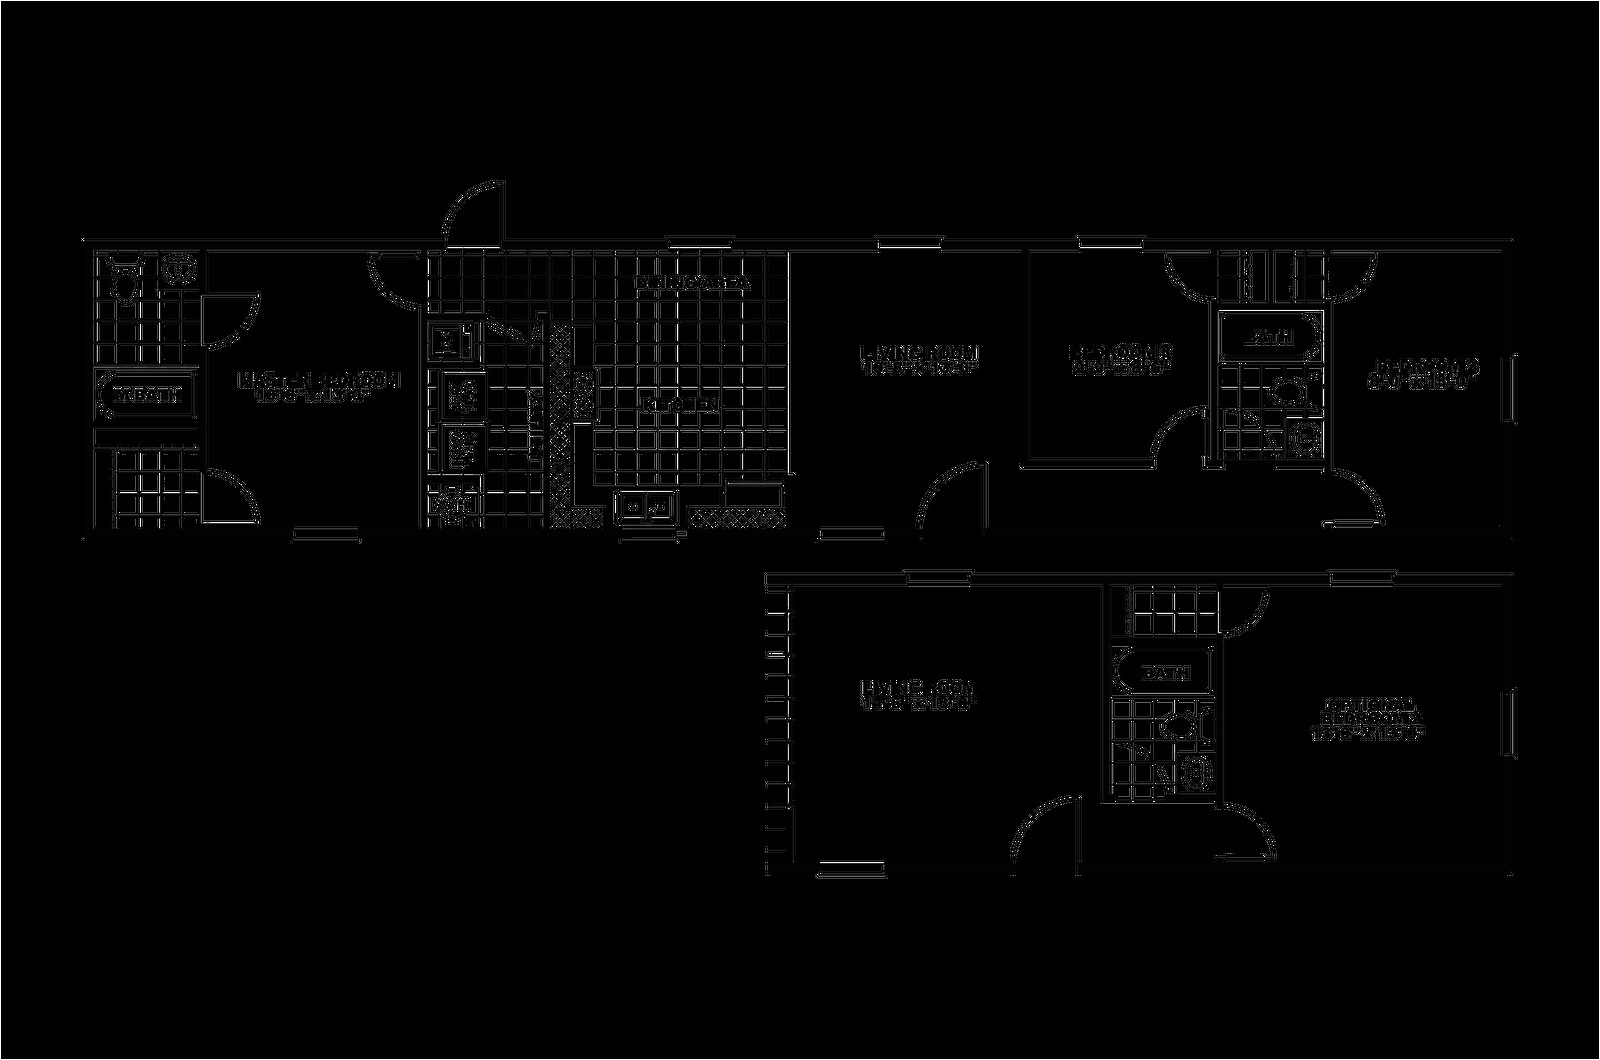 1999 liberty mobile home floor plans